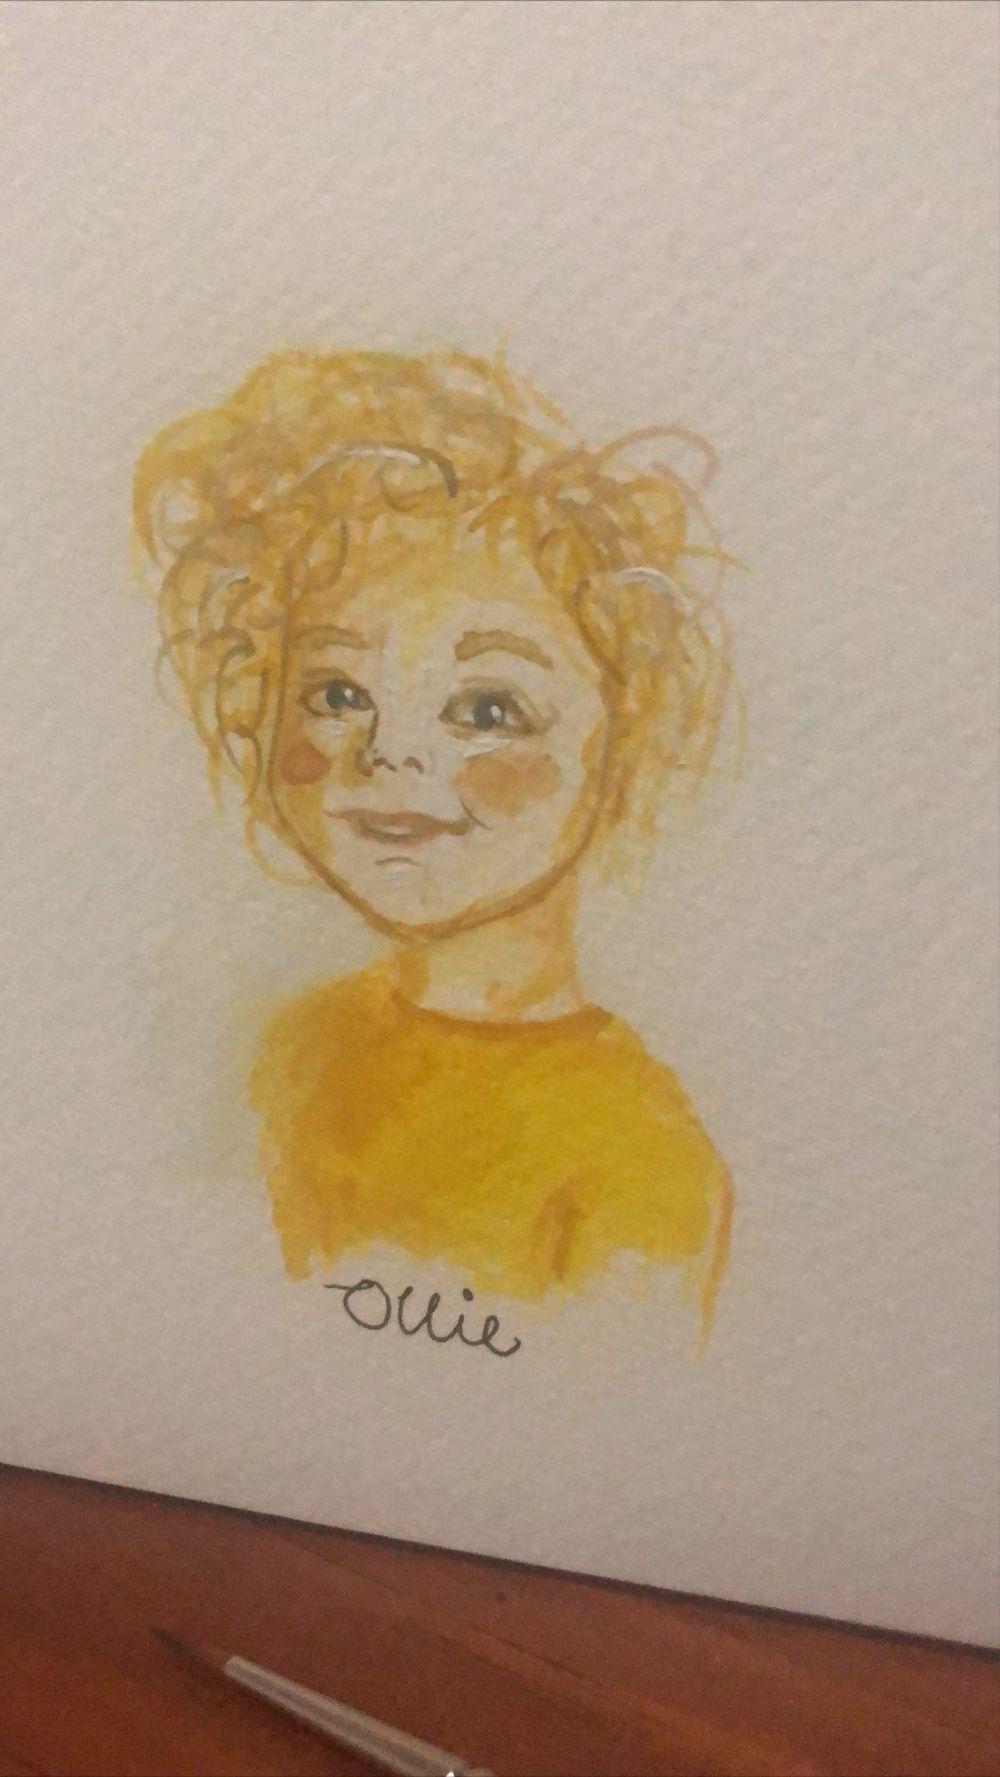 Little faces - Portrait of my son - image 1 - student project